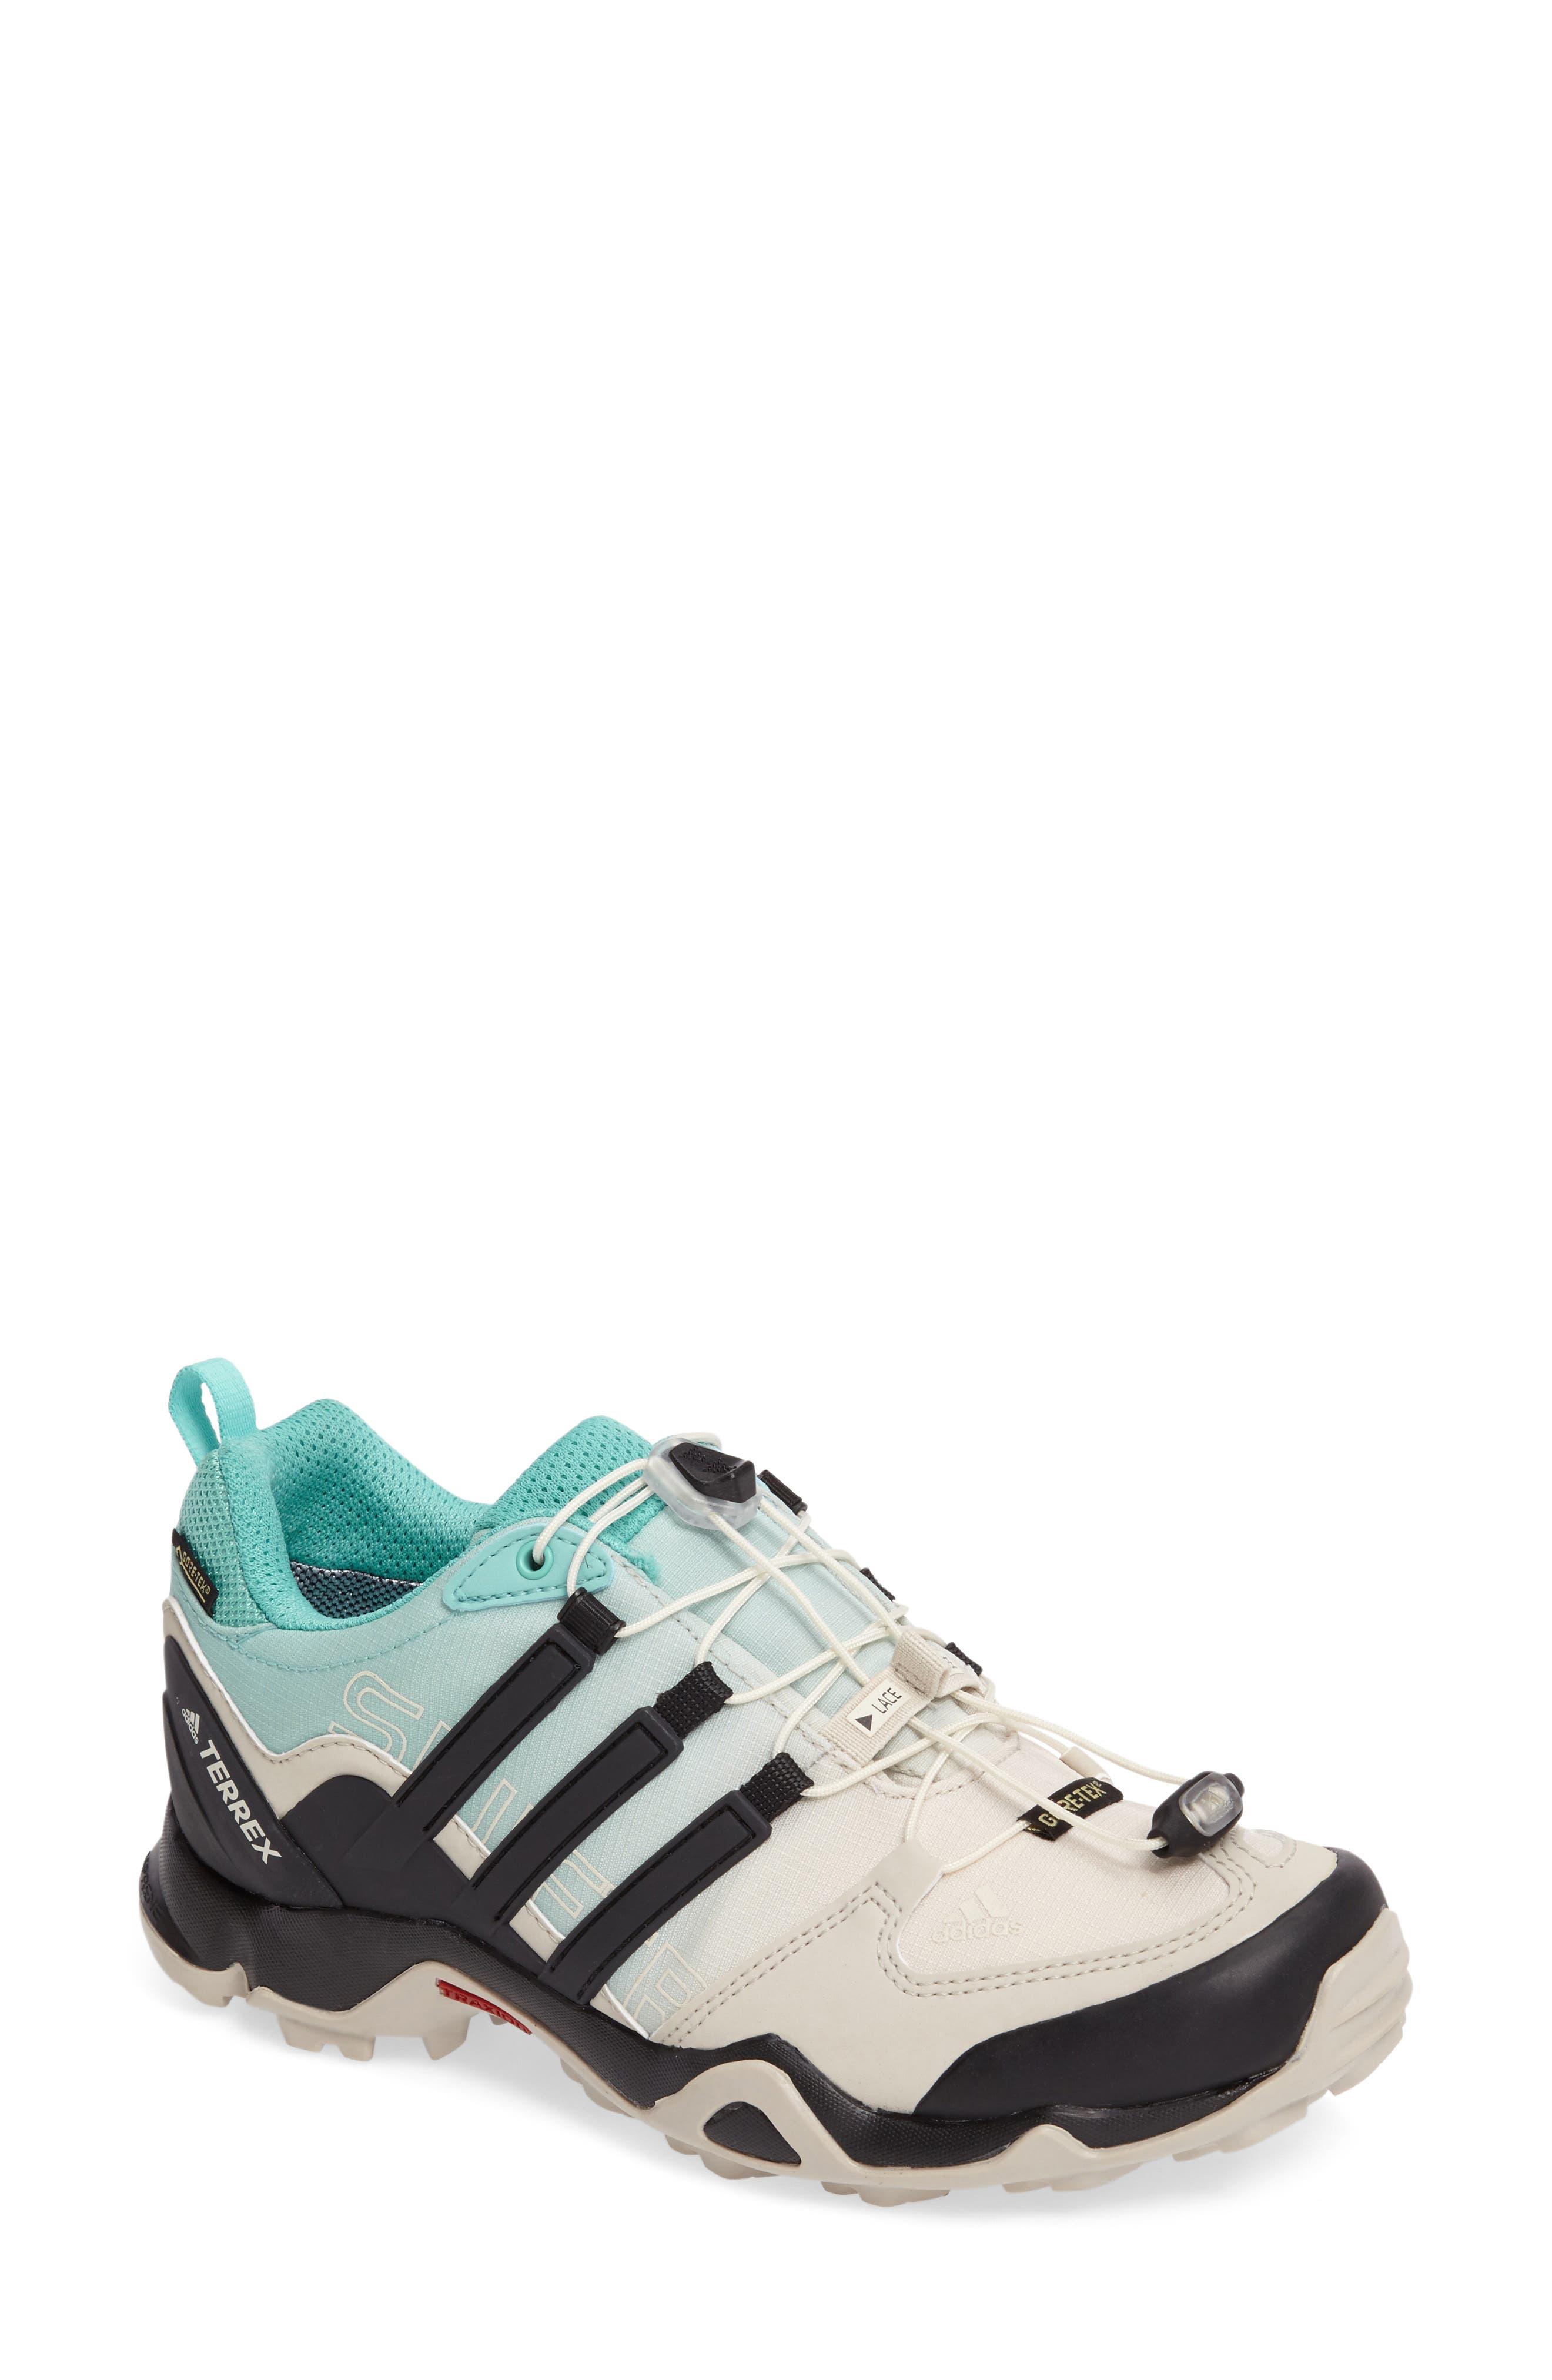 Terrex Swift R GTX Hiking Shoe,                             Main thumbnail 1, color,                             Clear Brown/ Black/ Easy Mint